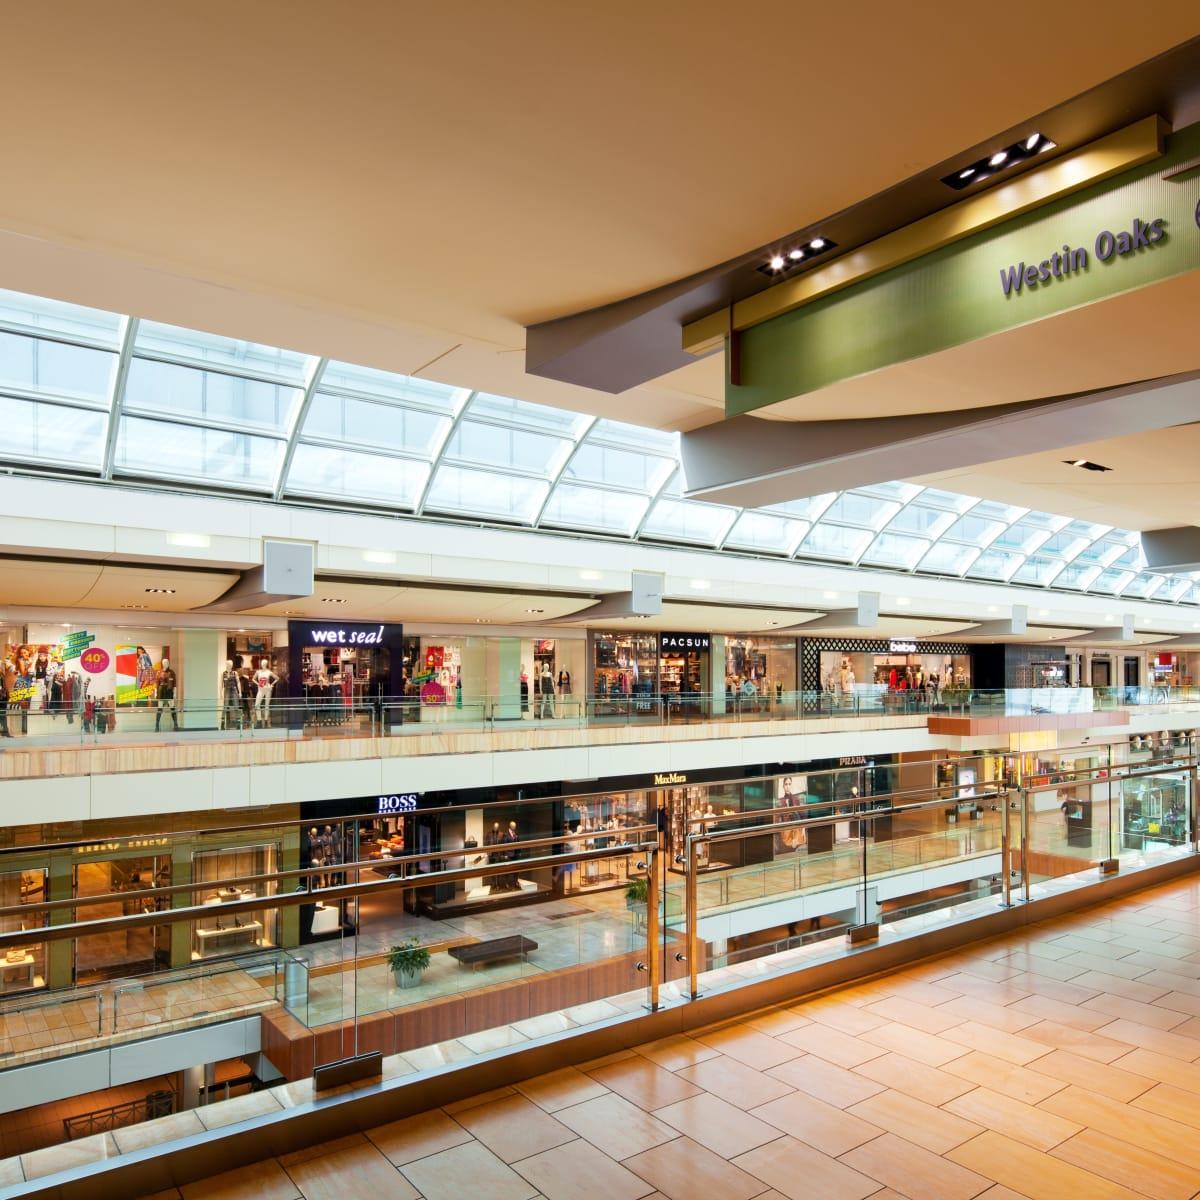 Westin Oaks Houston Galleria entrance